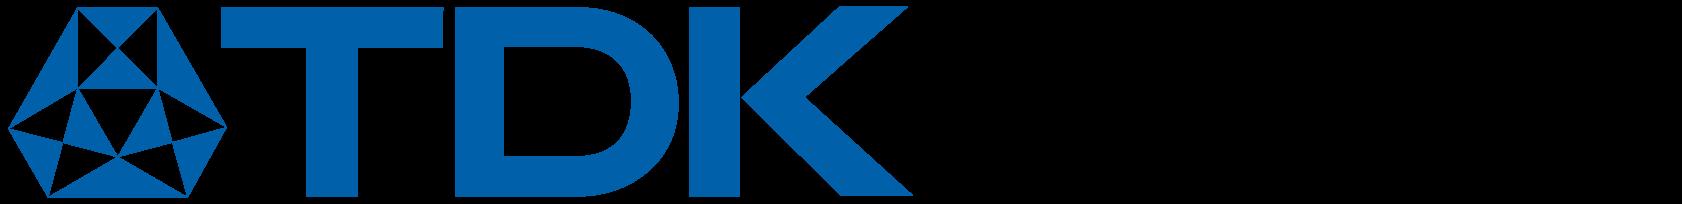 tdk.invensense logo yole sept2018